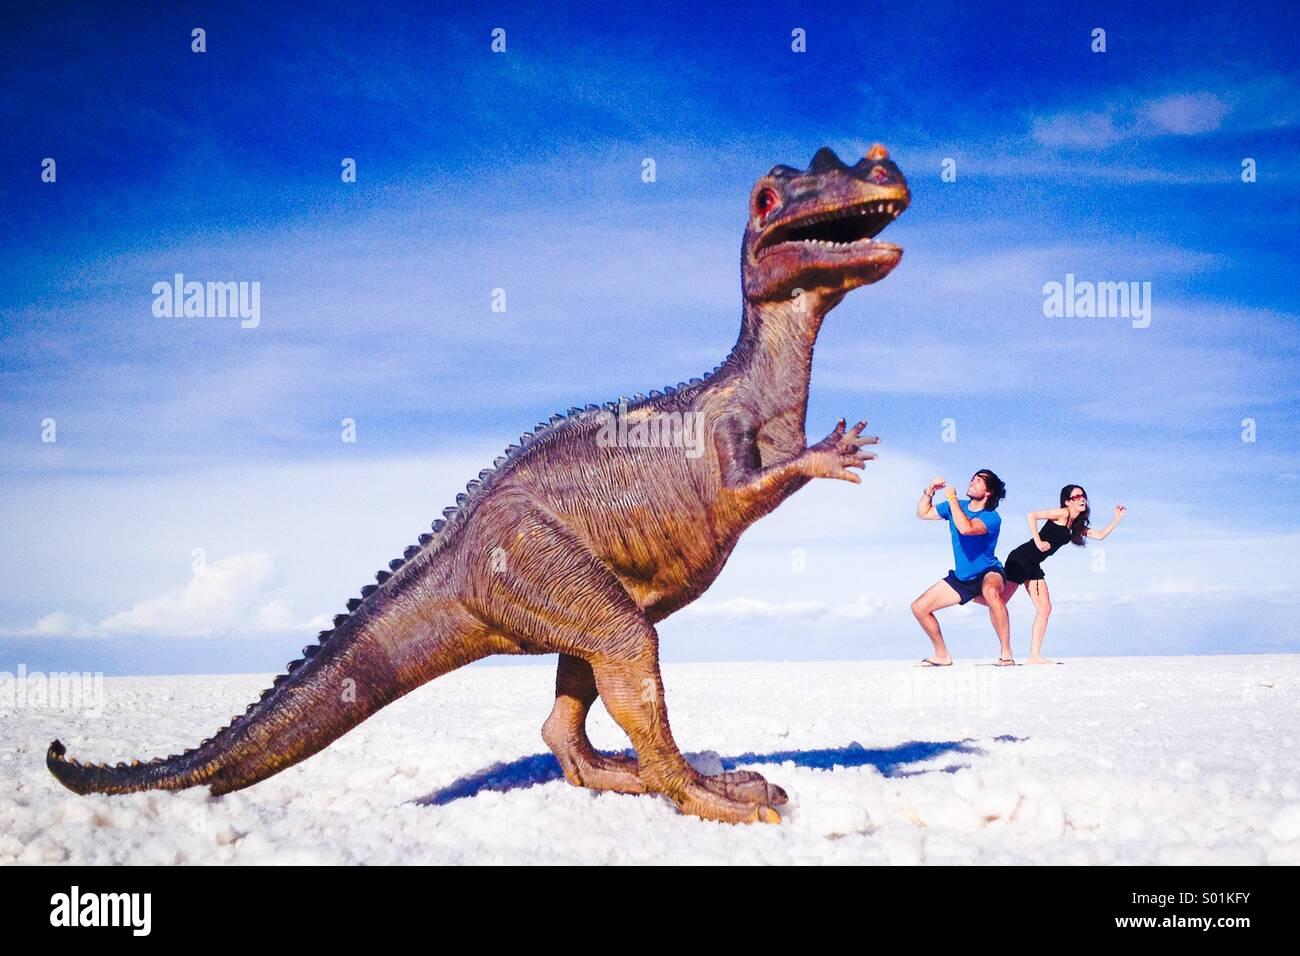 Dinosaurio Imagen De Stock